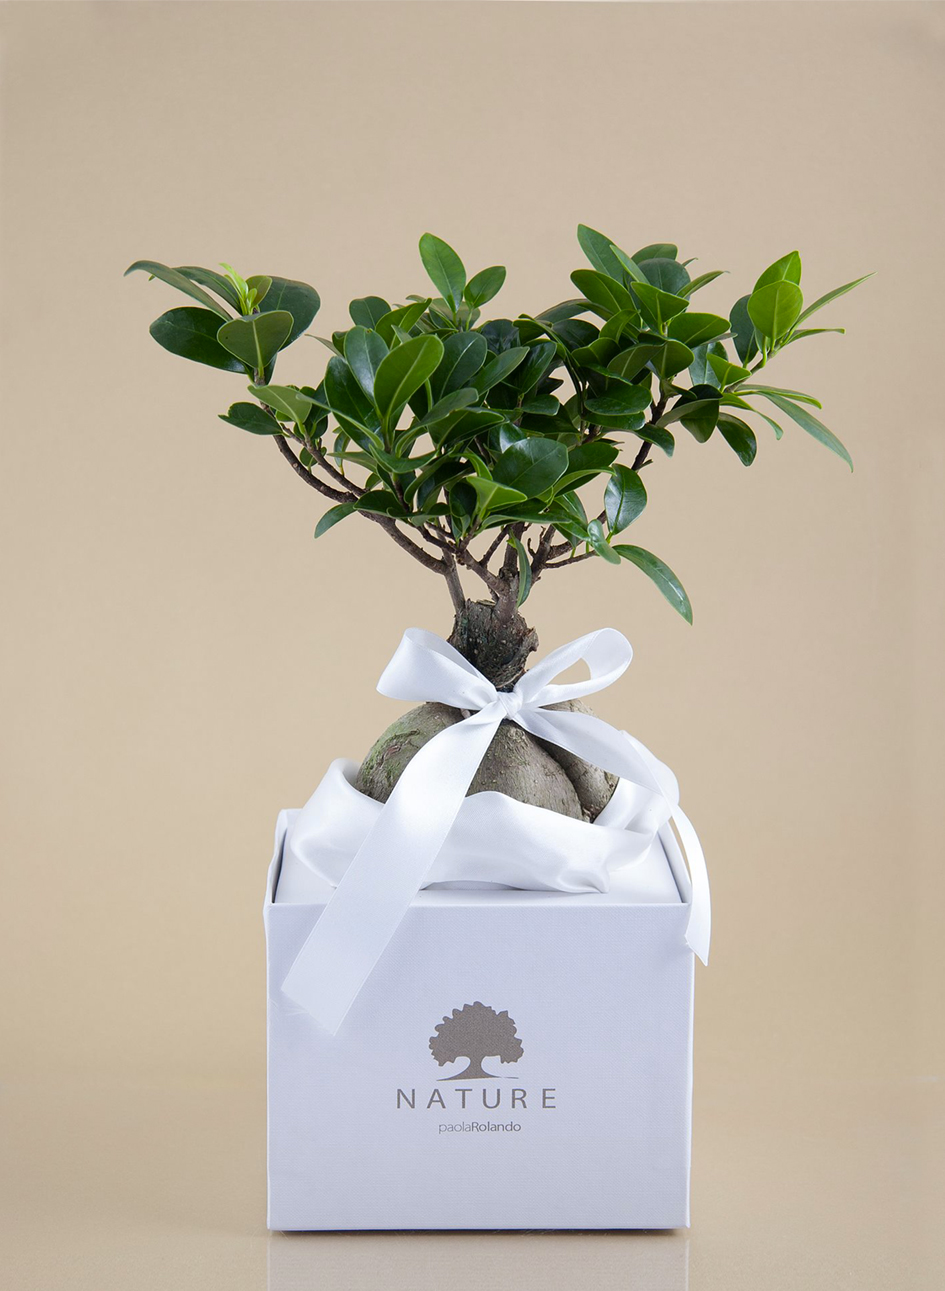 Vasi da esterno prezzi tavoli da giardino vermobil in for Vasi per bonsai prezzi